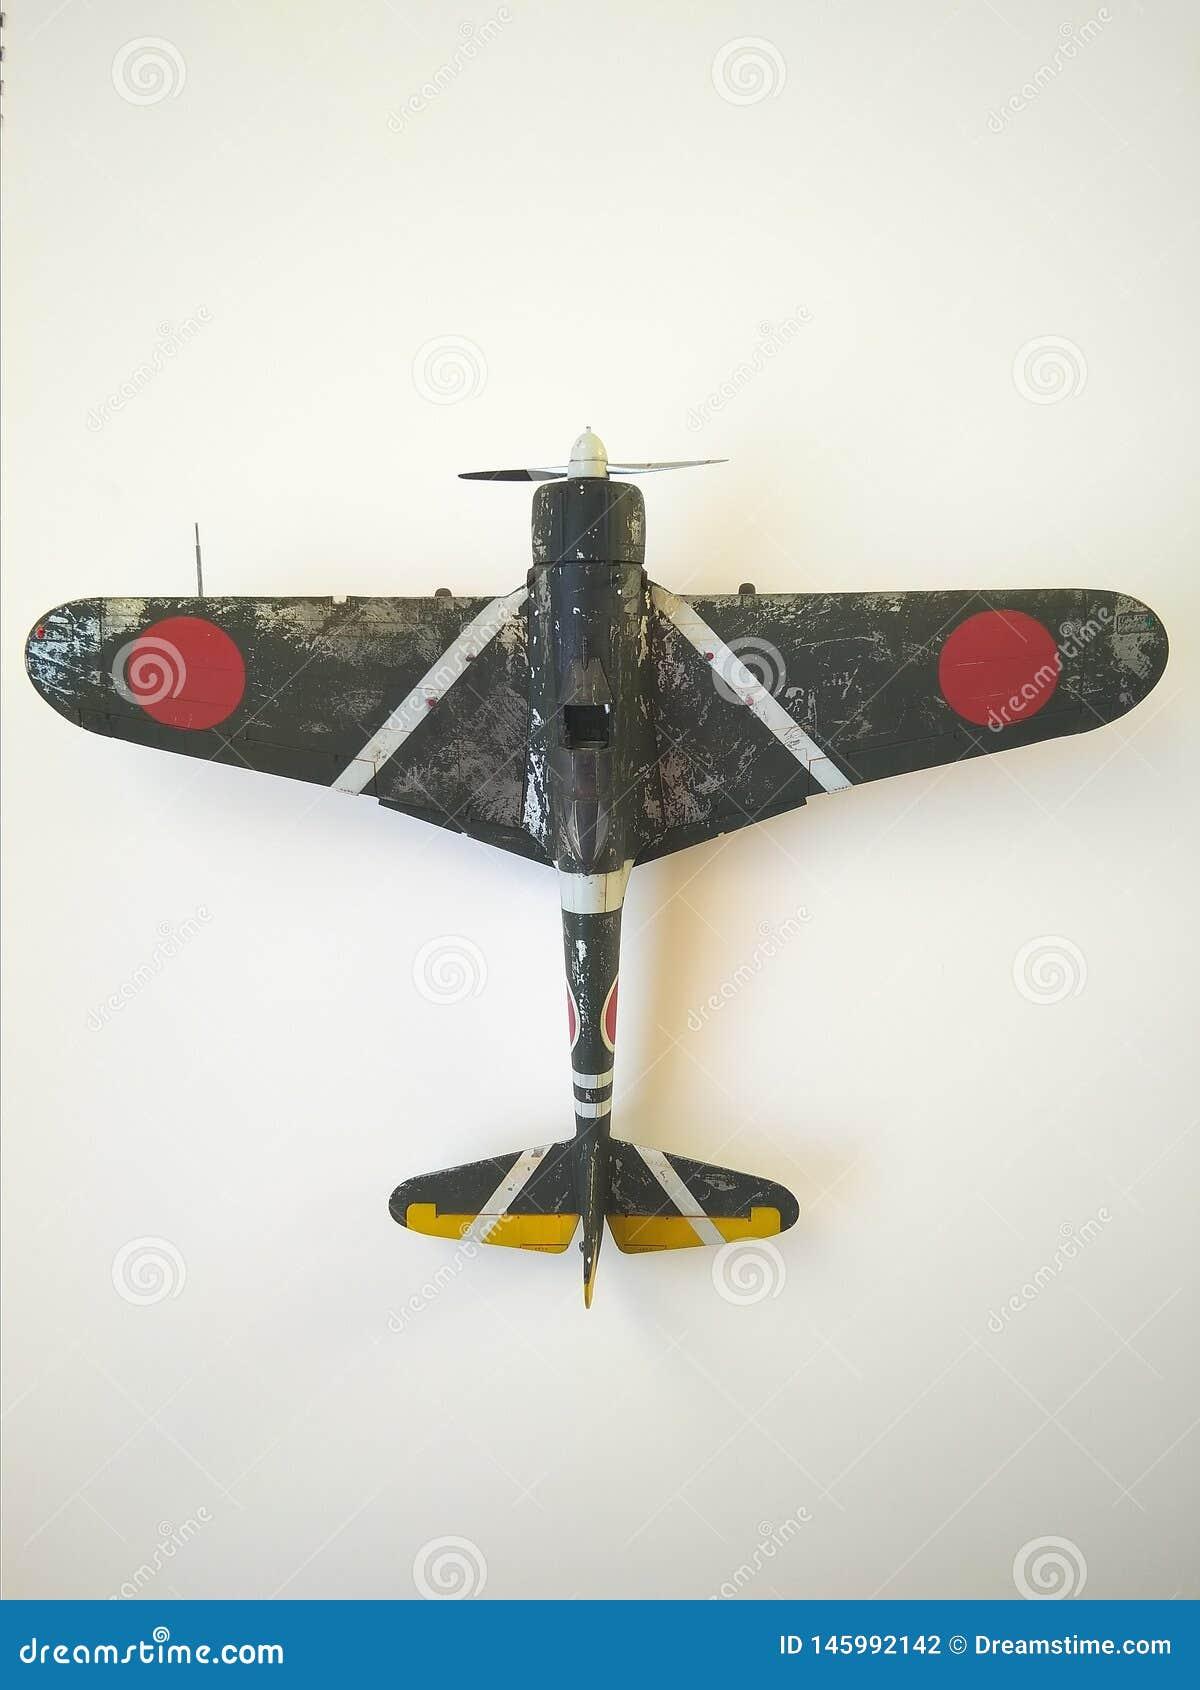 Nakajima Ki-43 Hayabusa model fighter